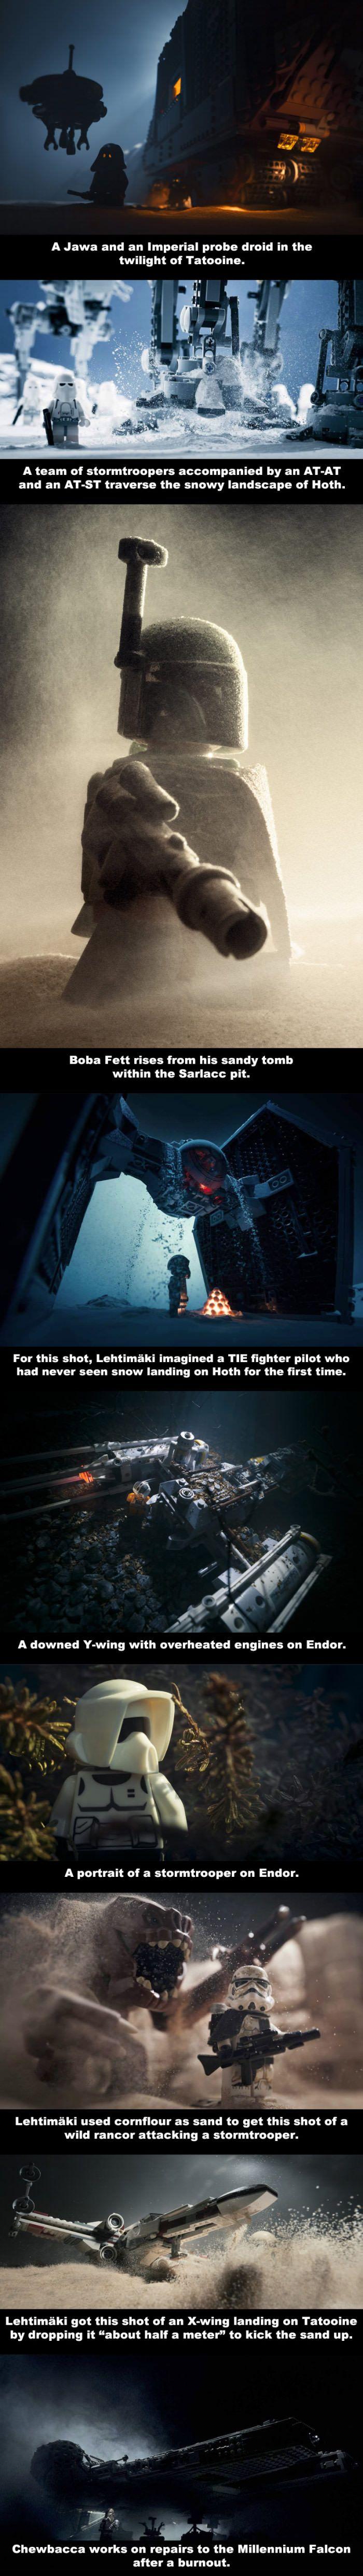 Epic Star Wars Movie Scenes Recreated By Lego (By Vesa Lehtimäki)